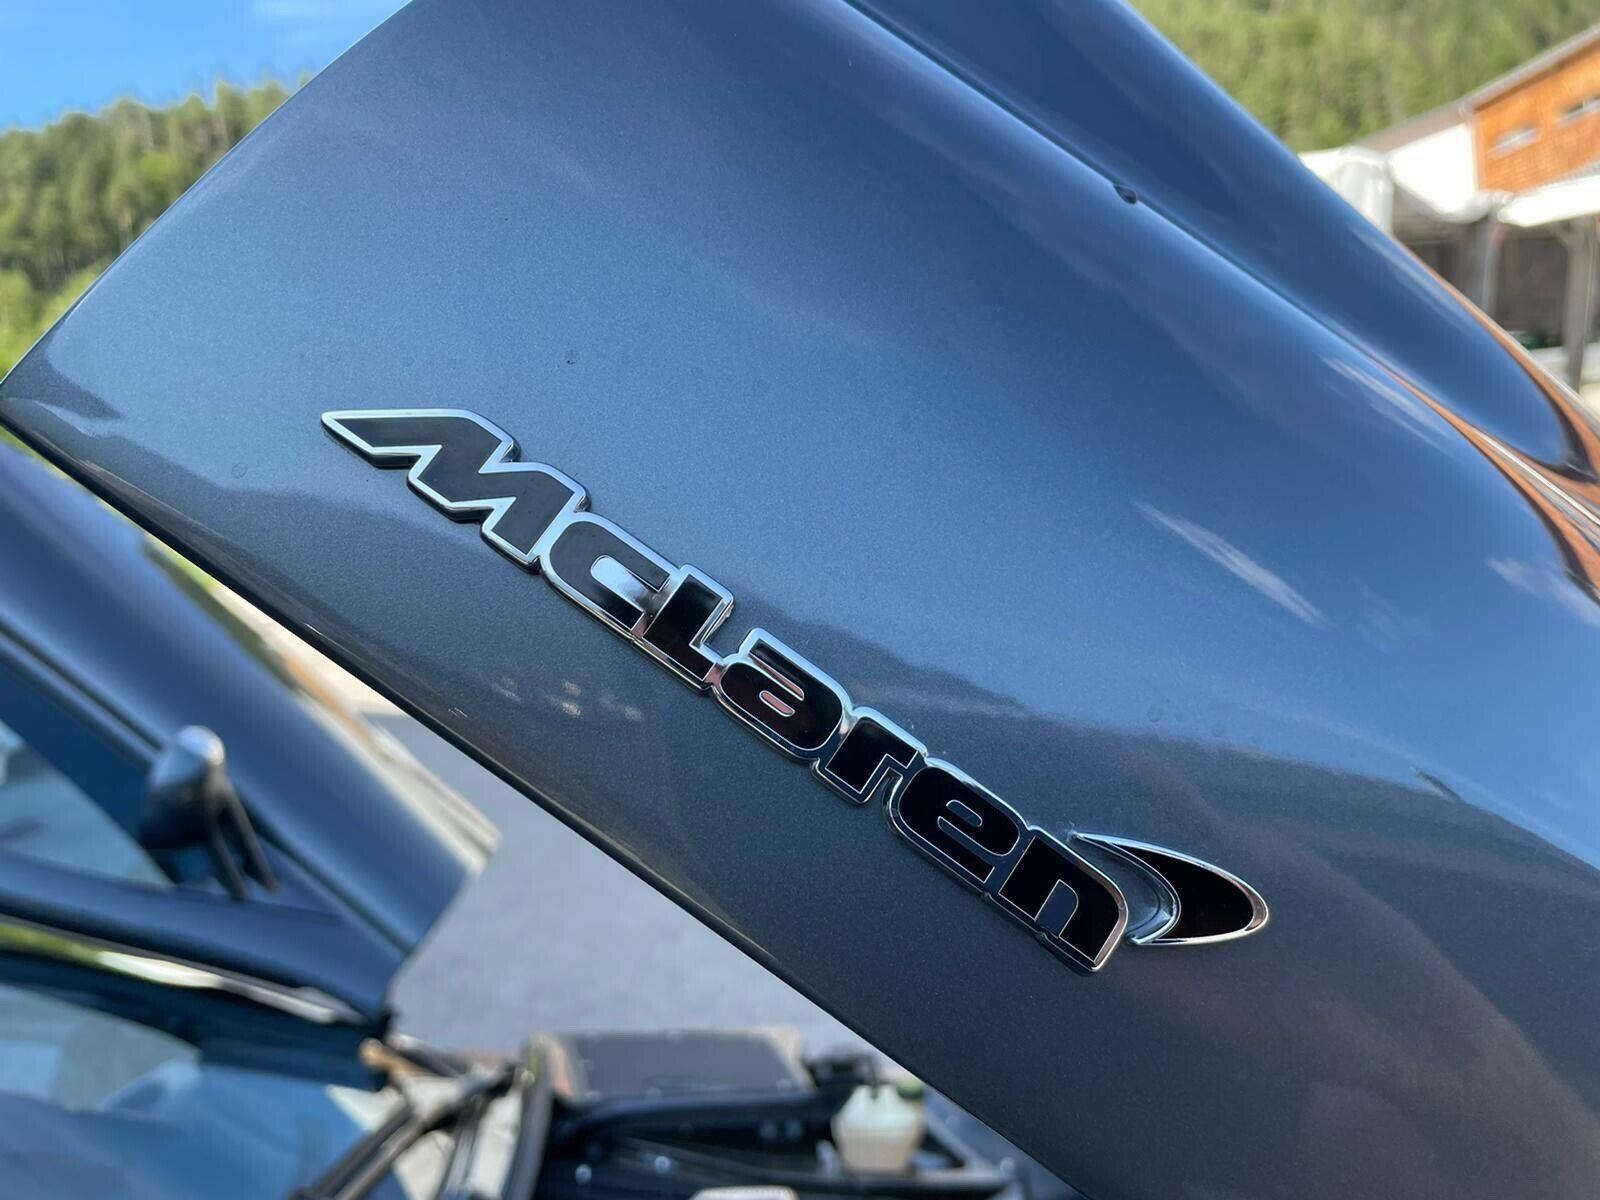 Mercedes-McLaren_SLR_722S_McLaren-Edition_sale-0003